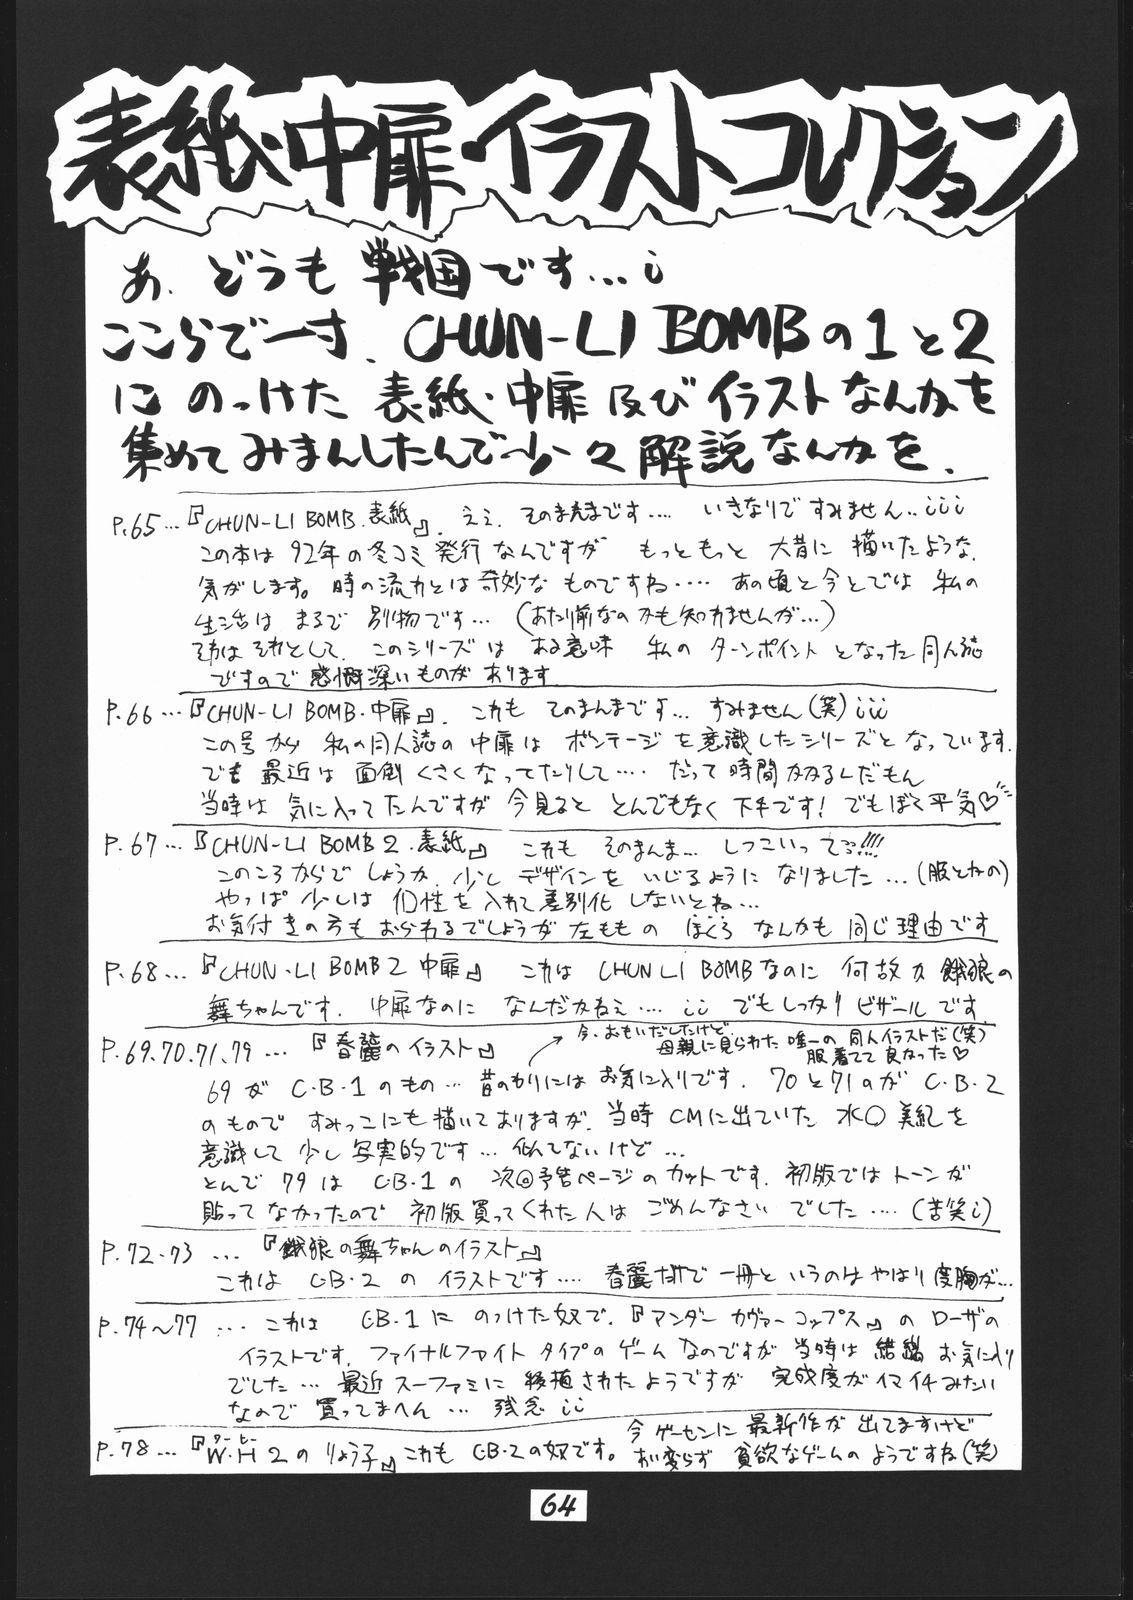 Chun-Li Side A 64